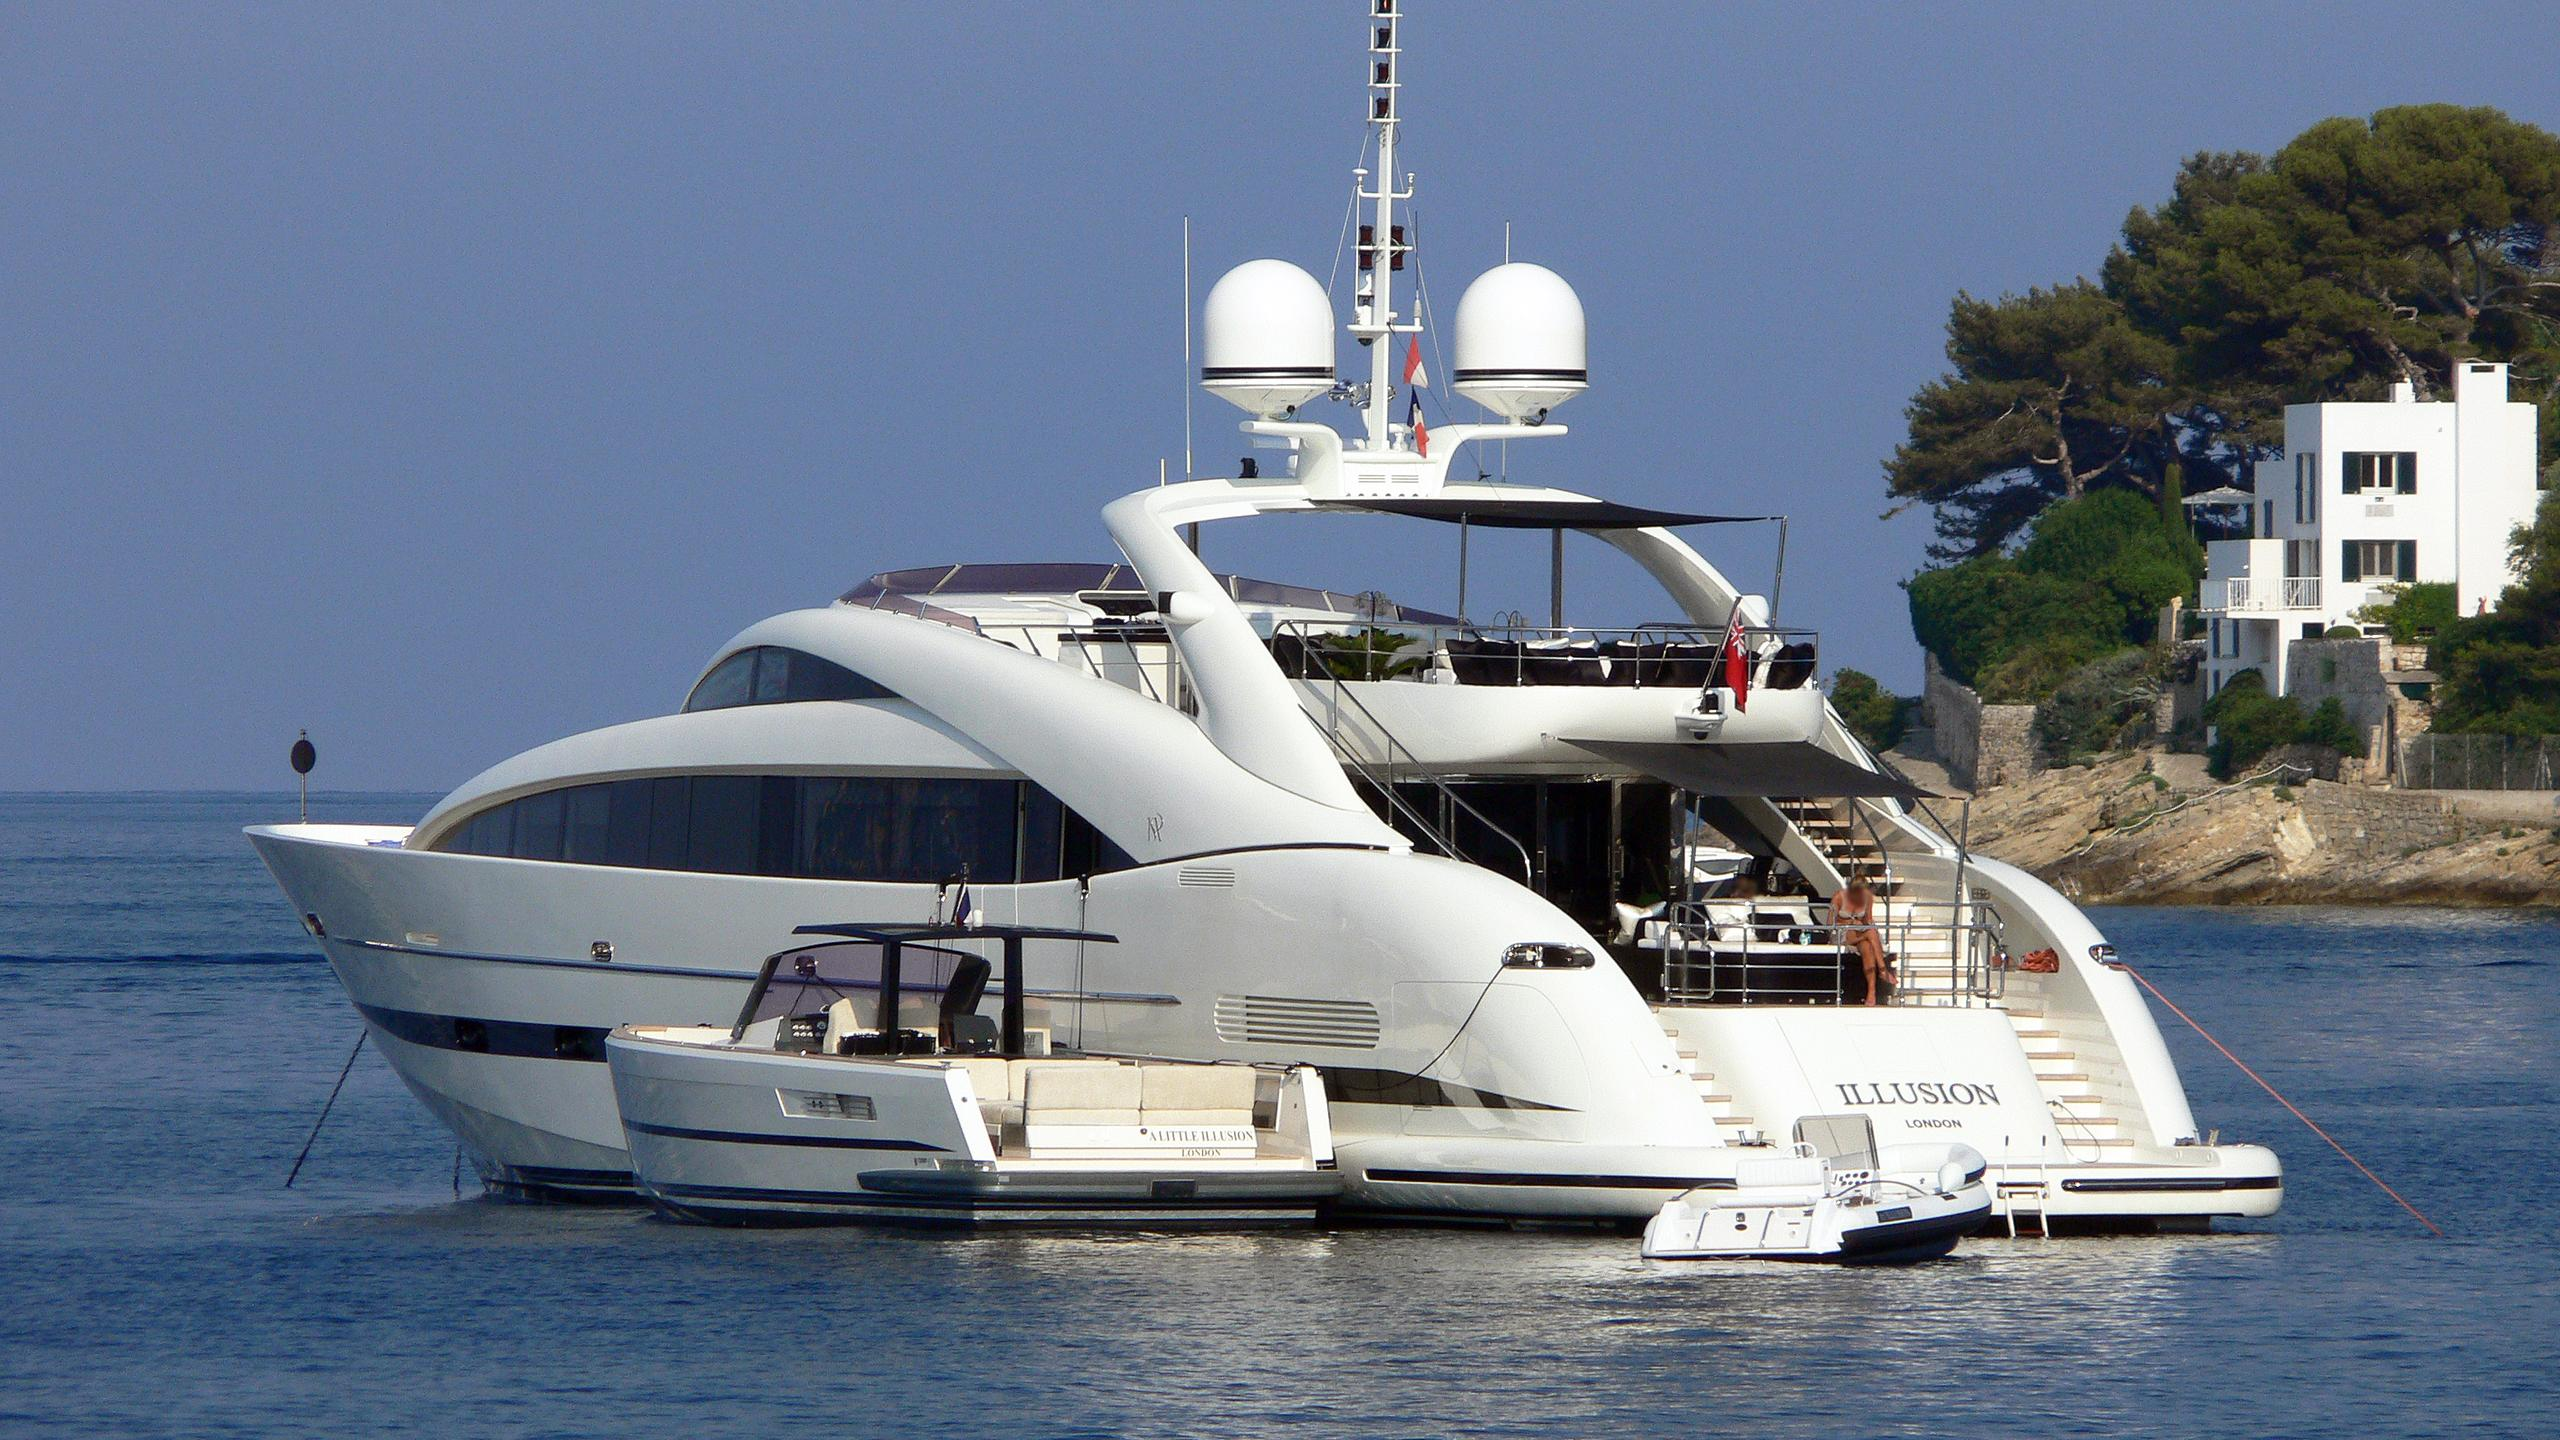 sealyon-motor-yacht-isa-120-2007-36m-tender-stern